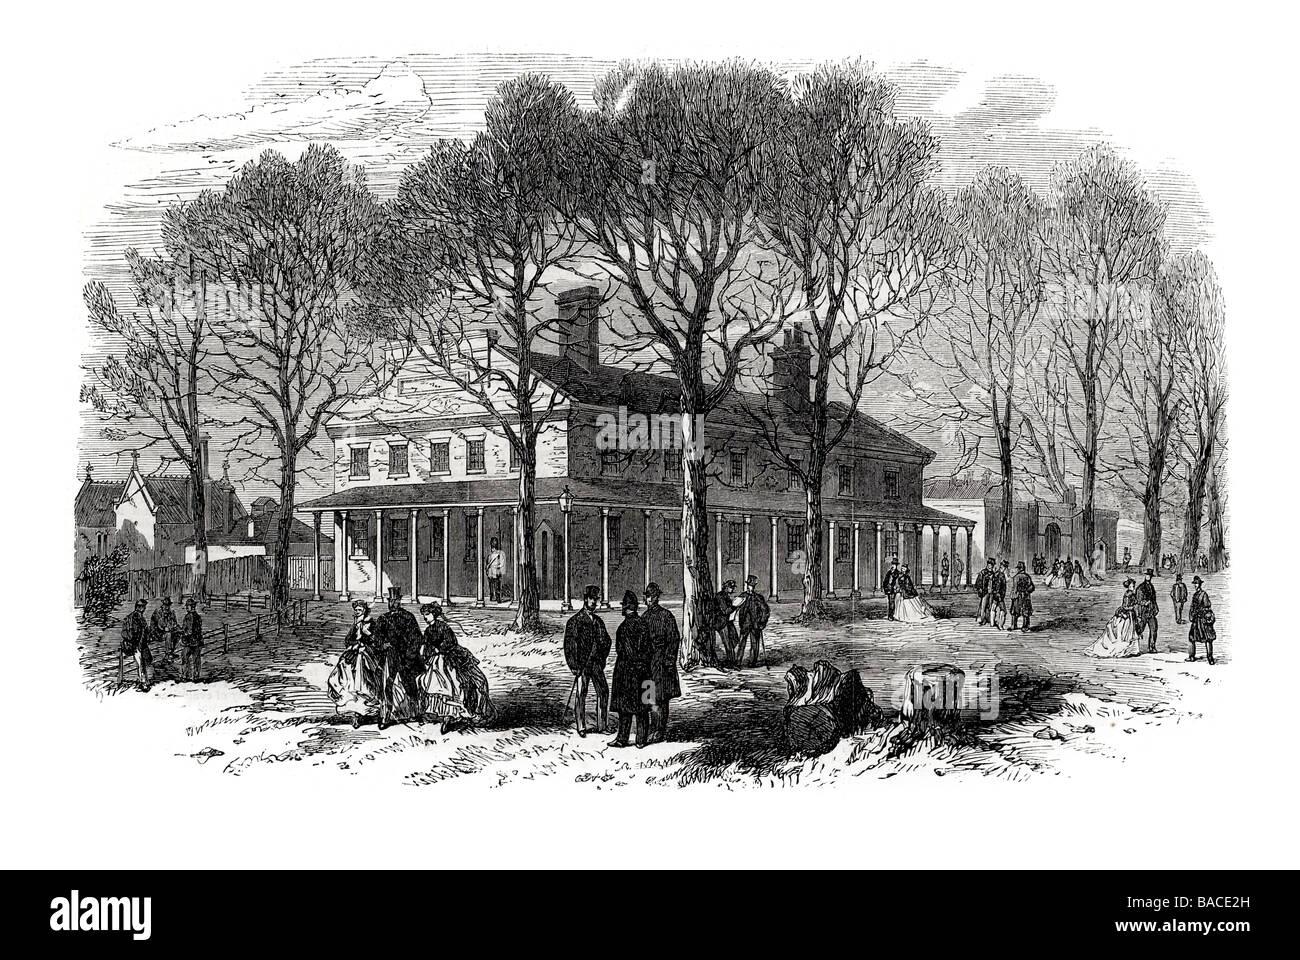 the police station magazine barrack hyde park 1867 Knightsbridge London Household Cavalry - Stock Image